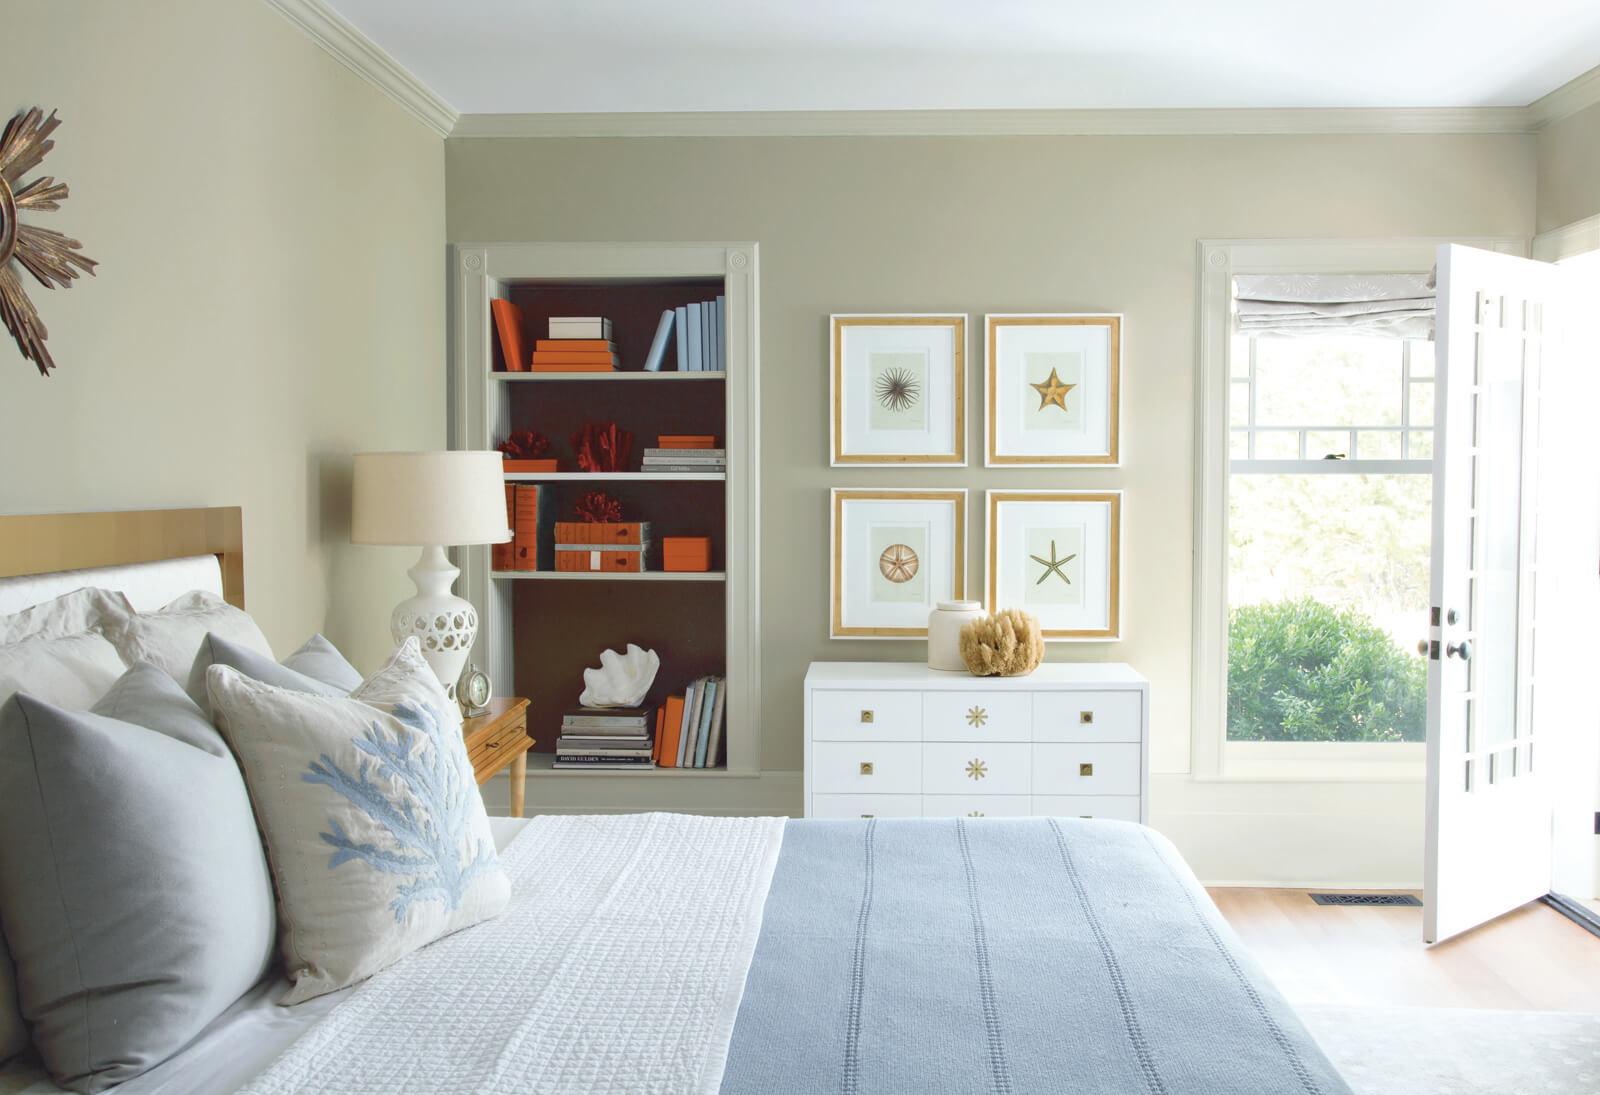 Bedroom_with_Sea_Decor.jpg